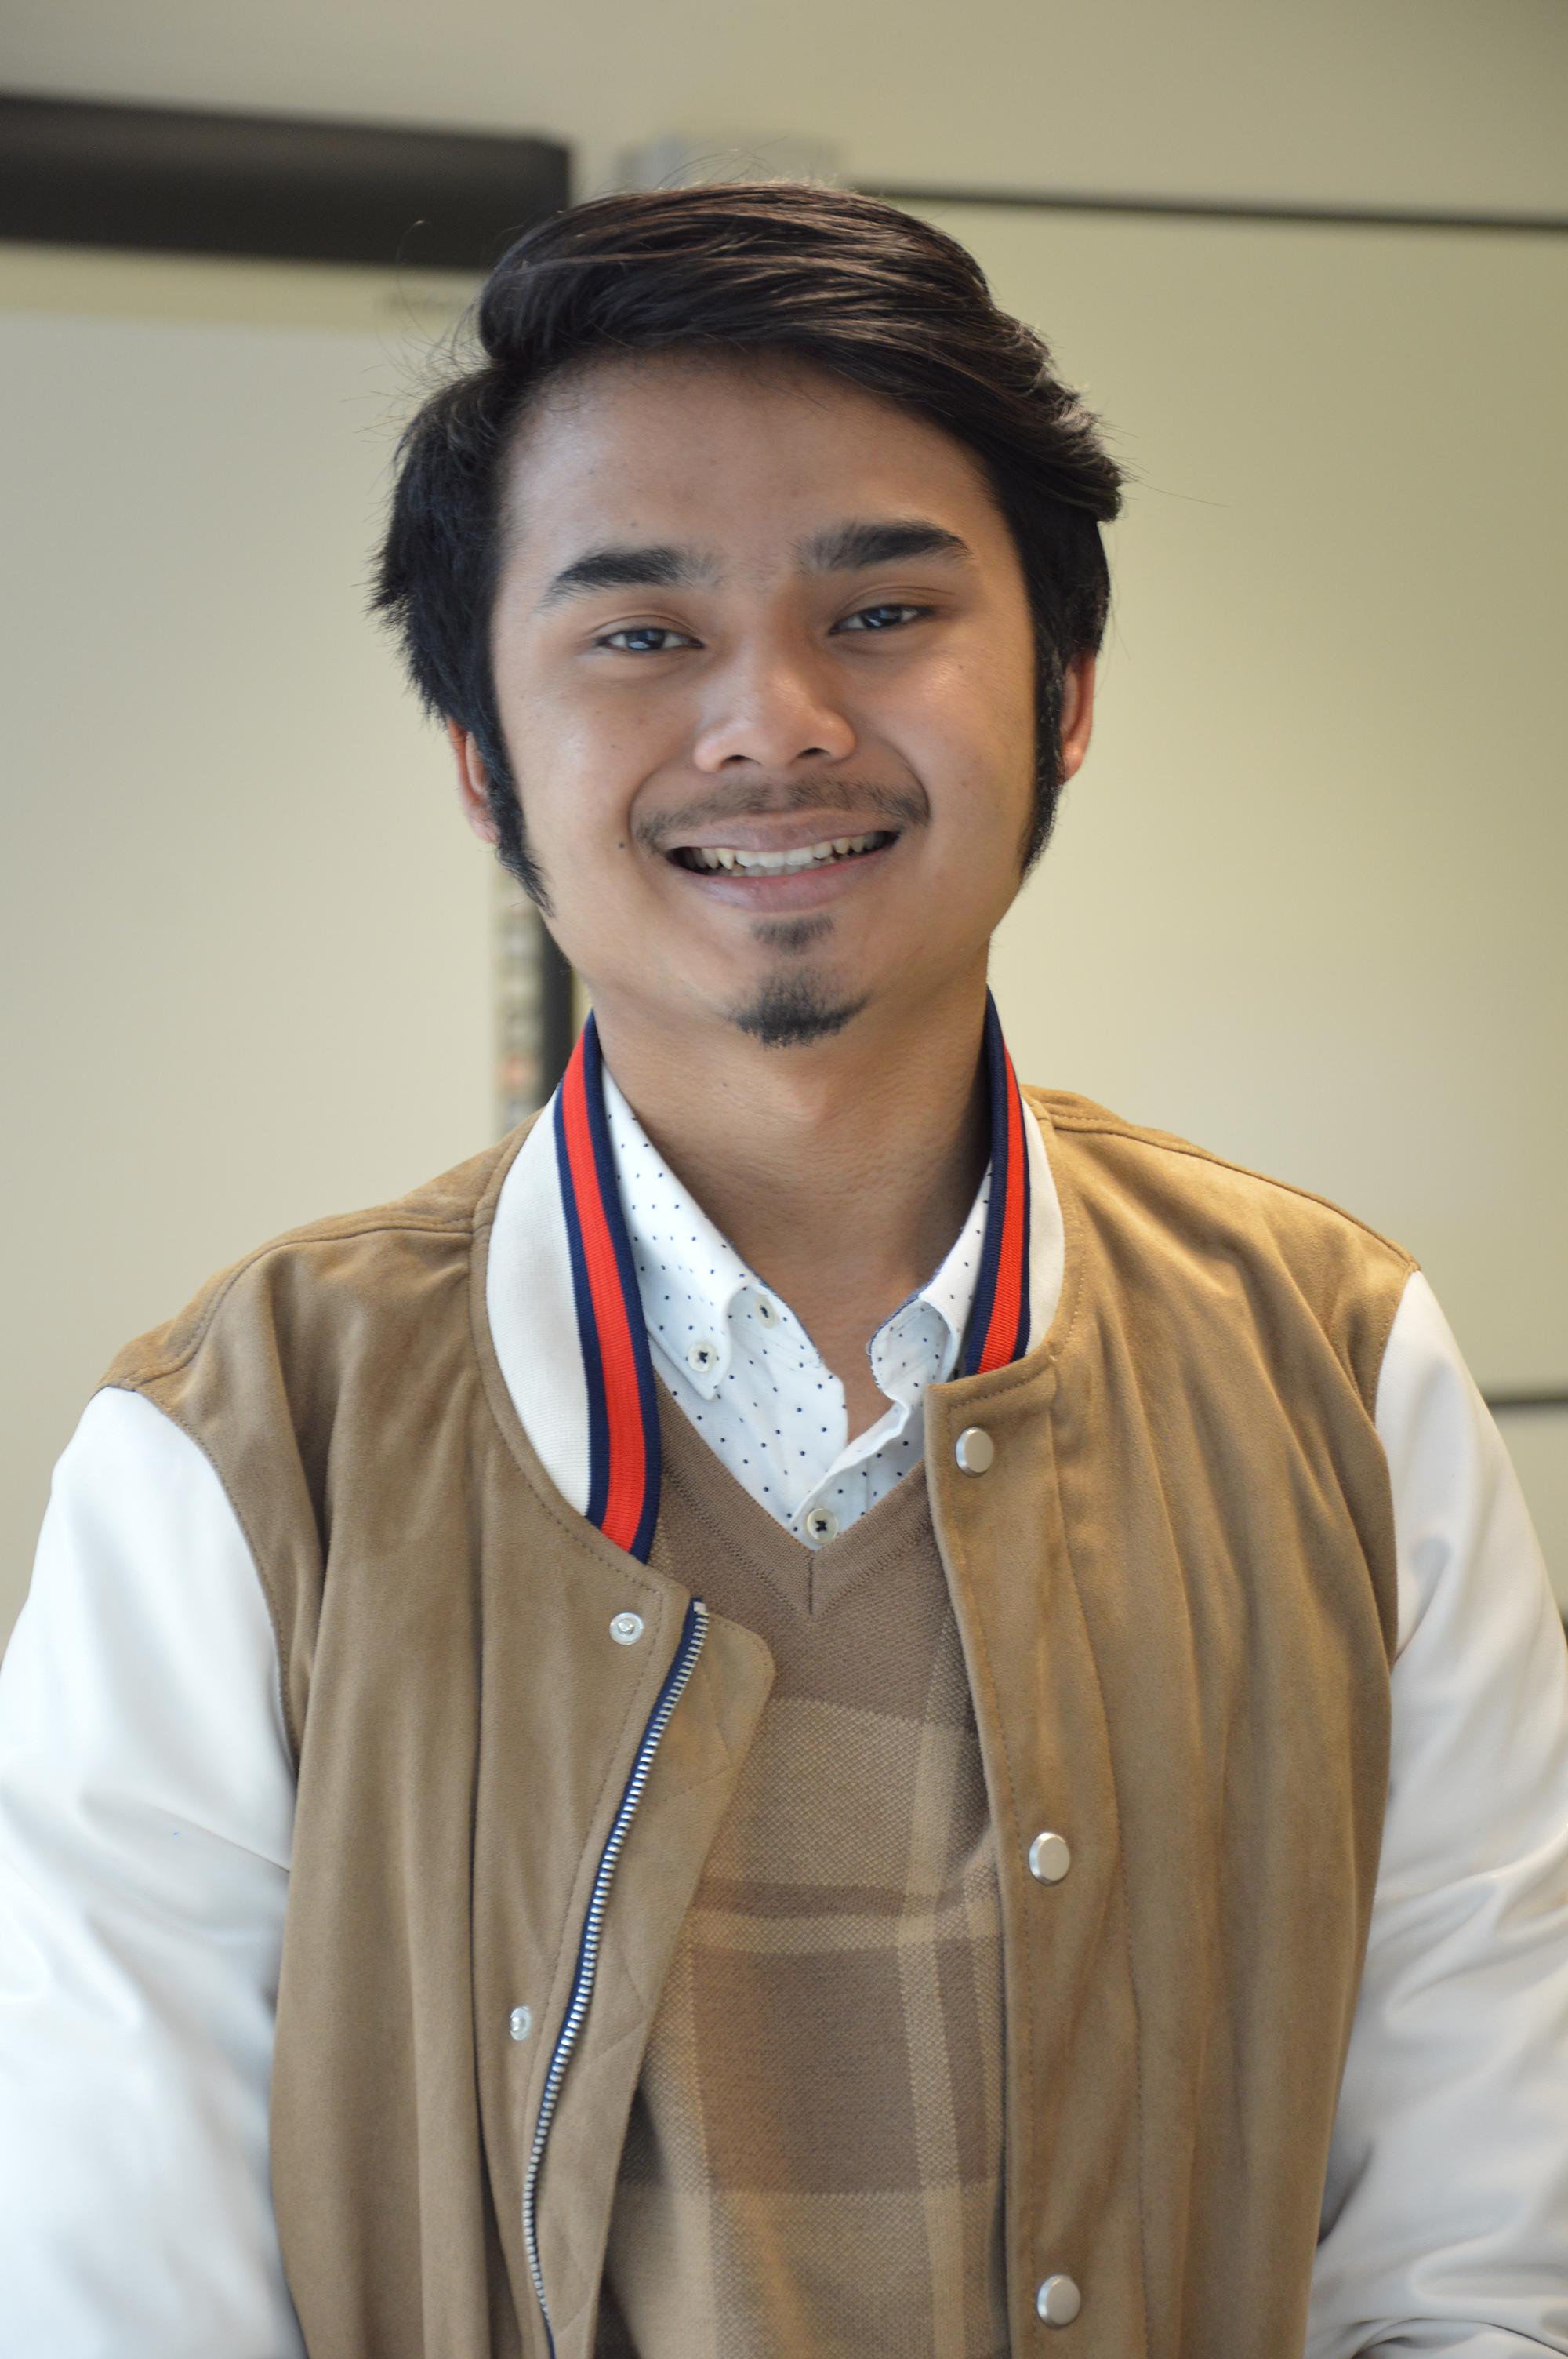 Photo of international student Aman at INTO London